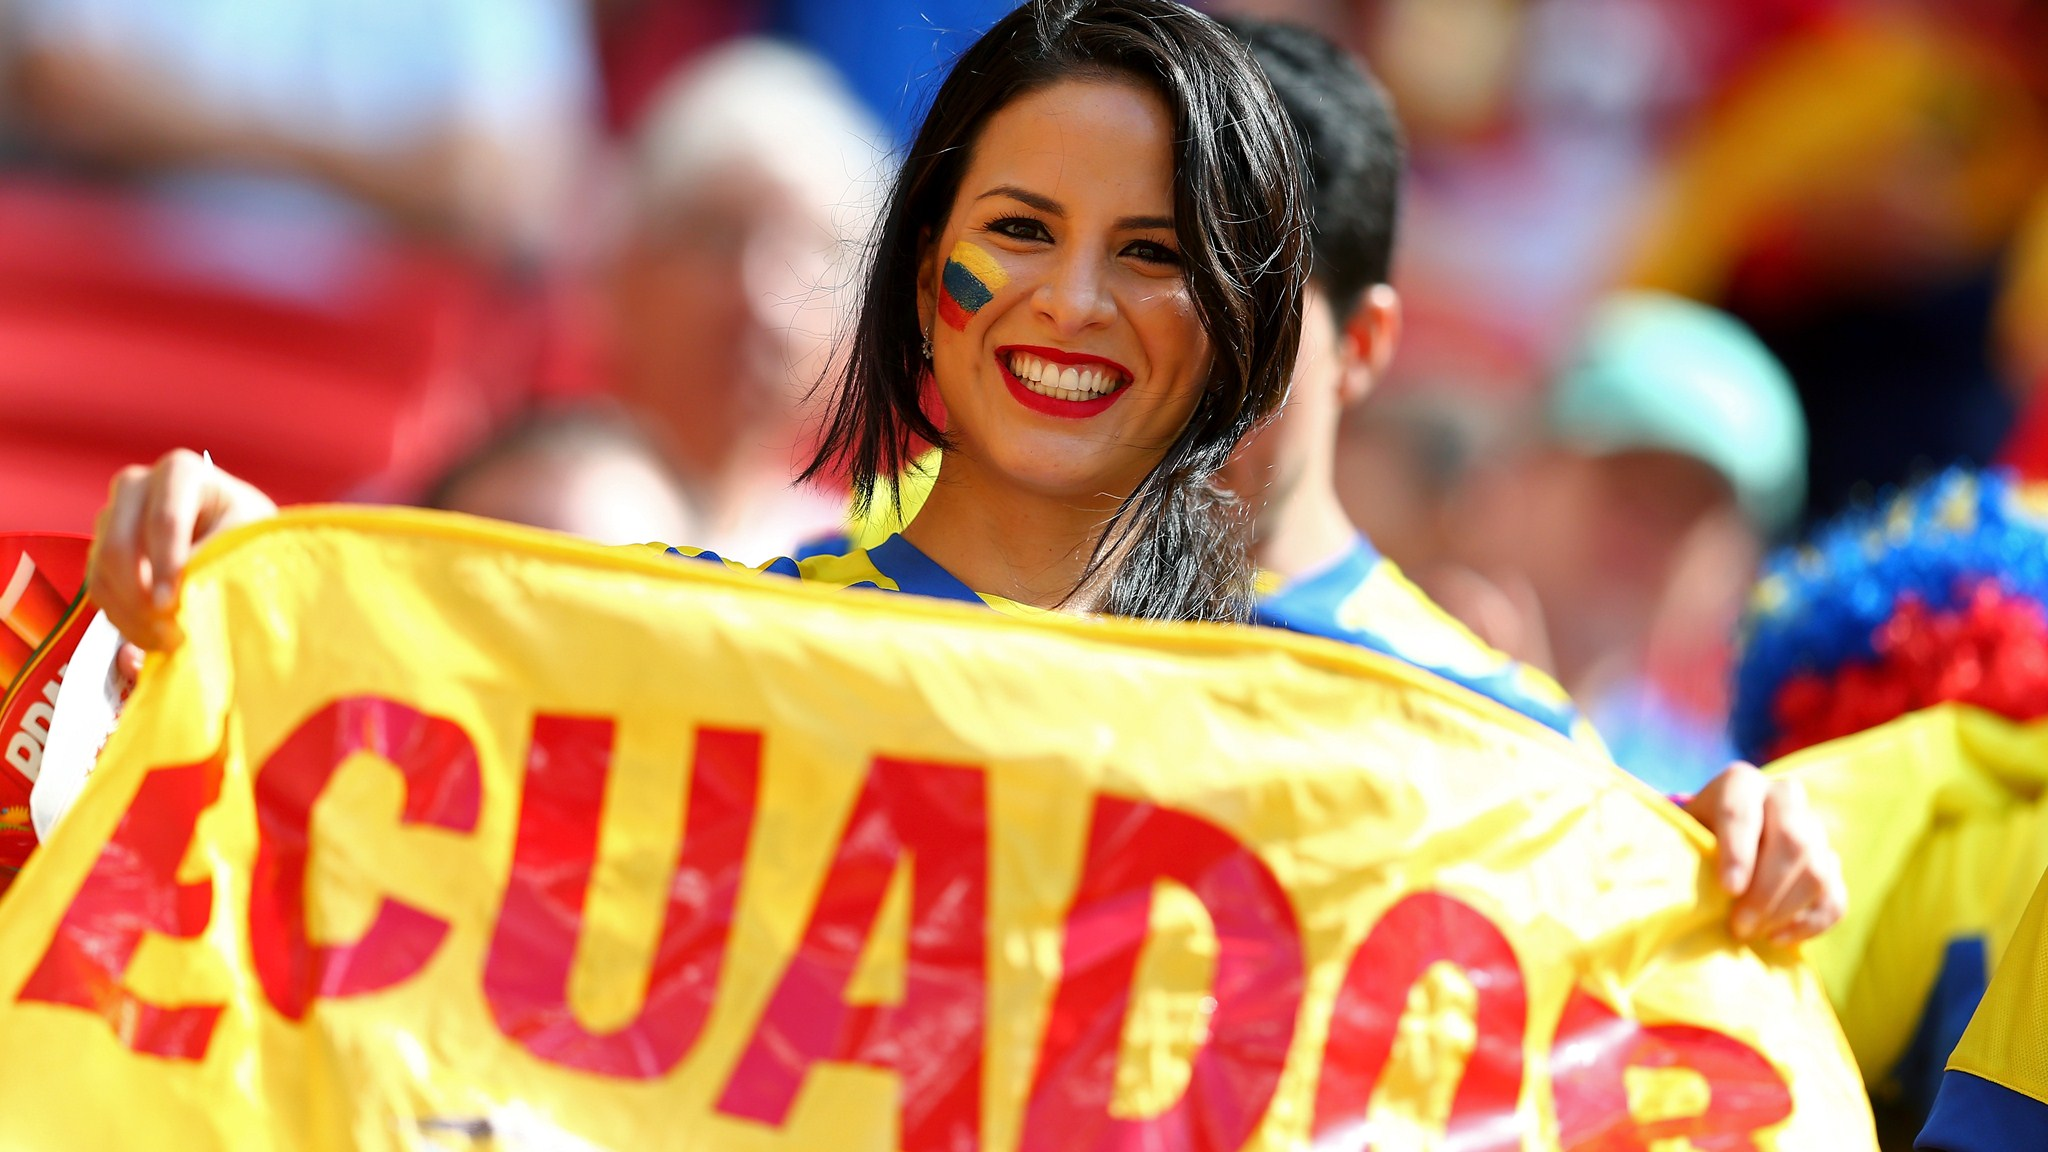 148 - Switzerland-Ecuador [2-1] -- 15 Jun 2014 - 13-00 -- Brasilia - Estadio Nacional - kuaza